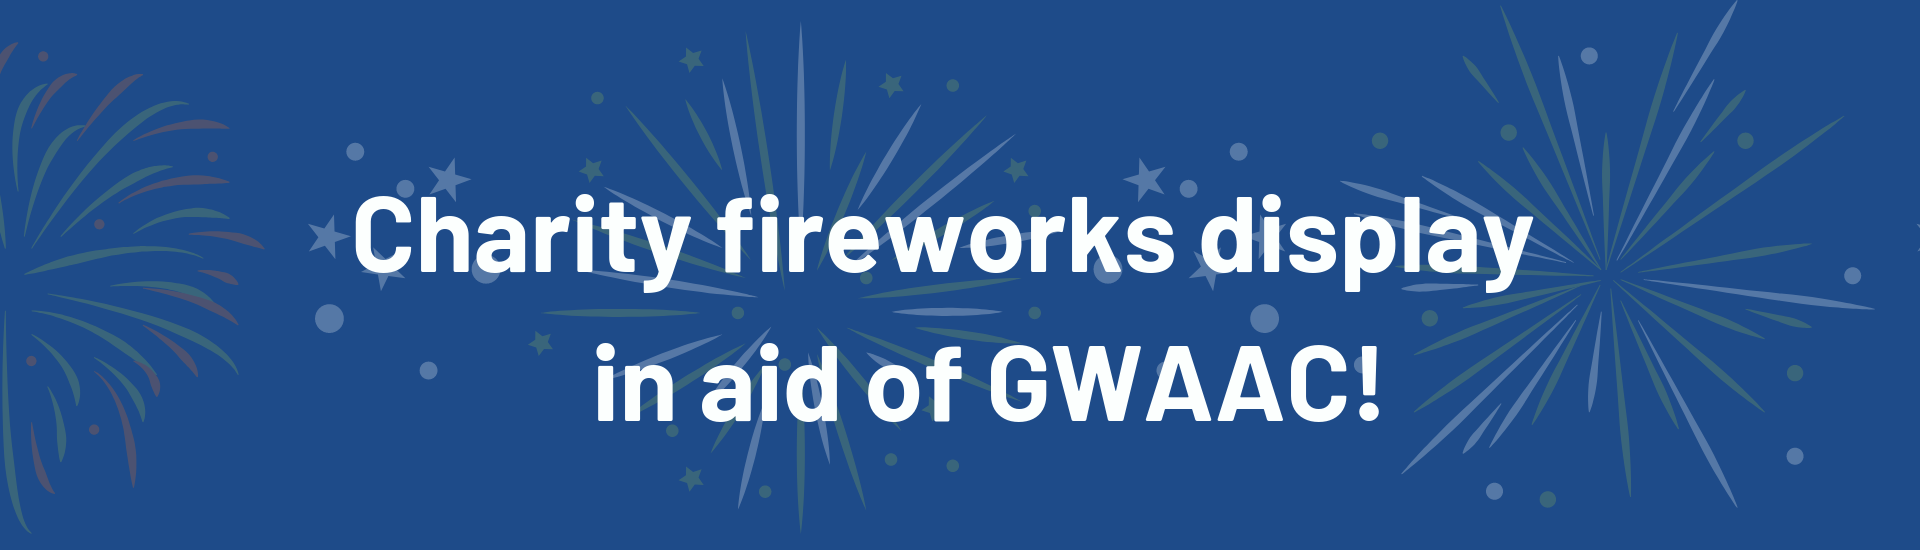 Charity fireworks display in aid of GWAAC!